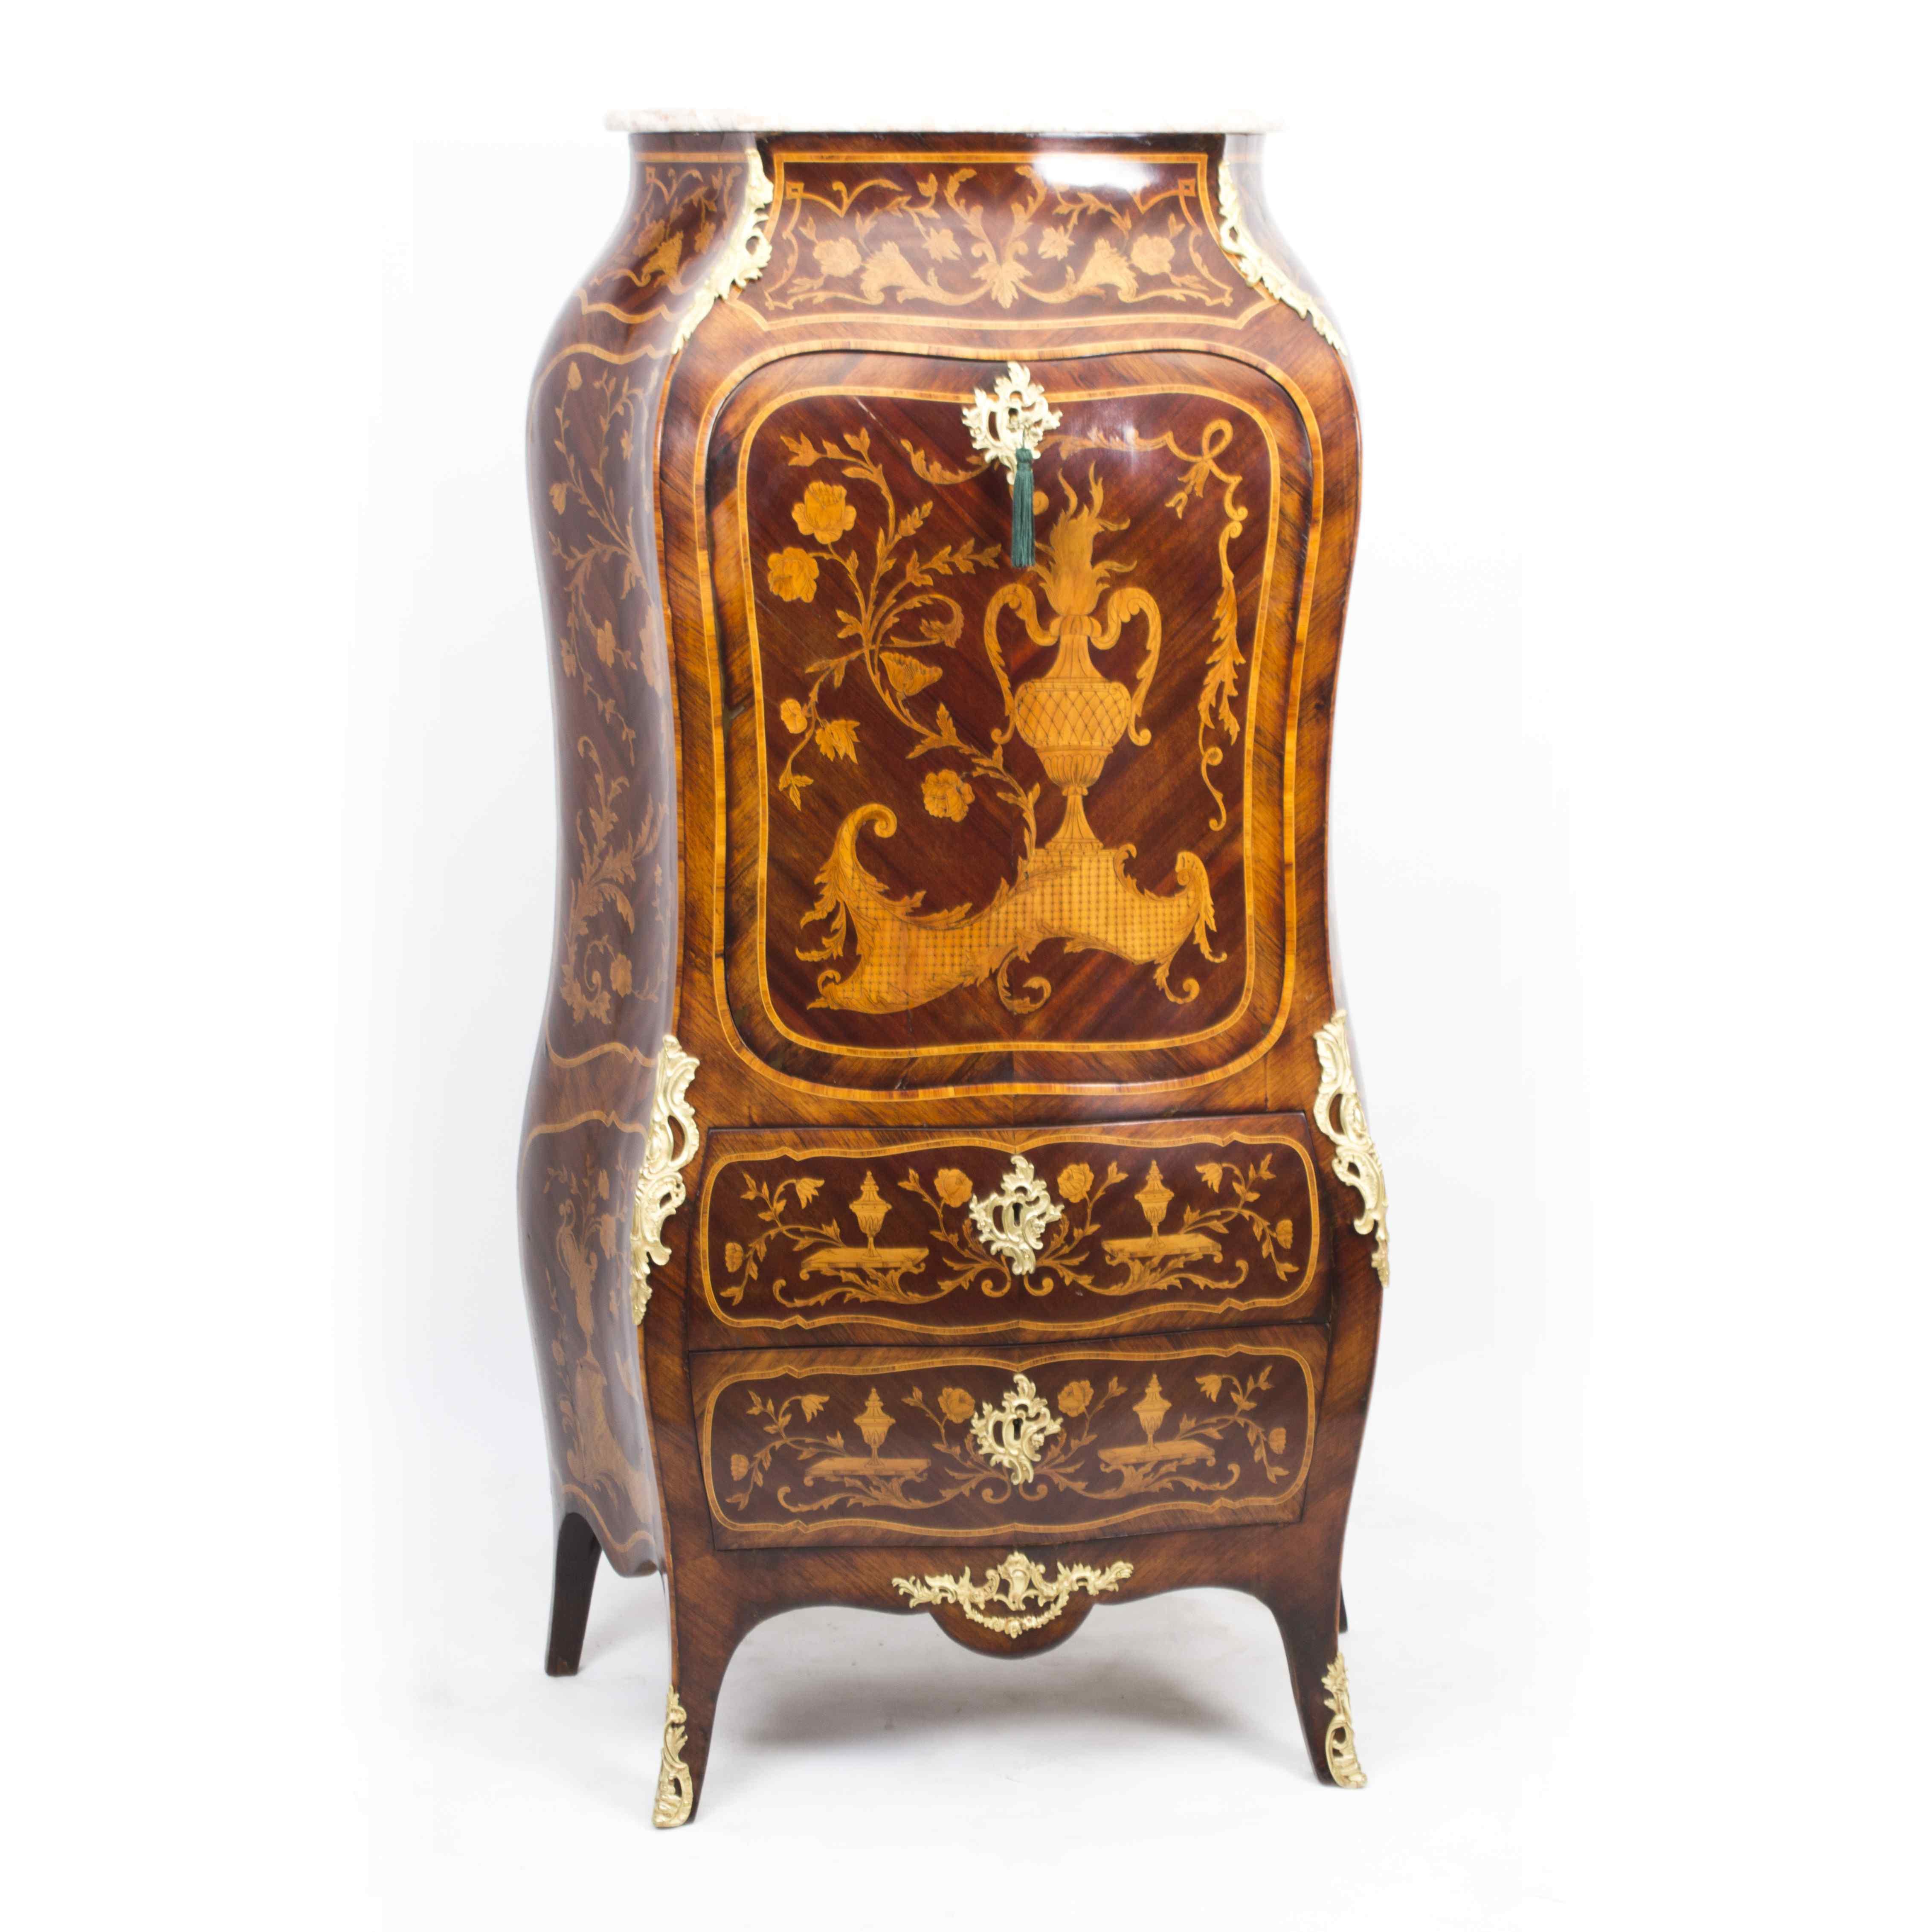 Antique Rococo Revival Marquetry Secretaire a Abattant C1850